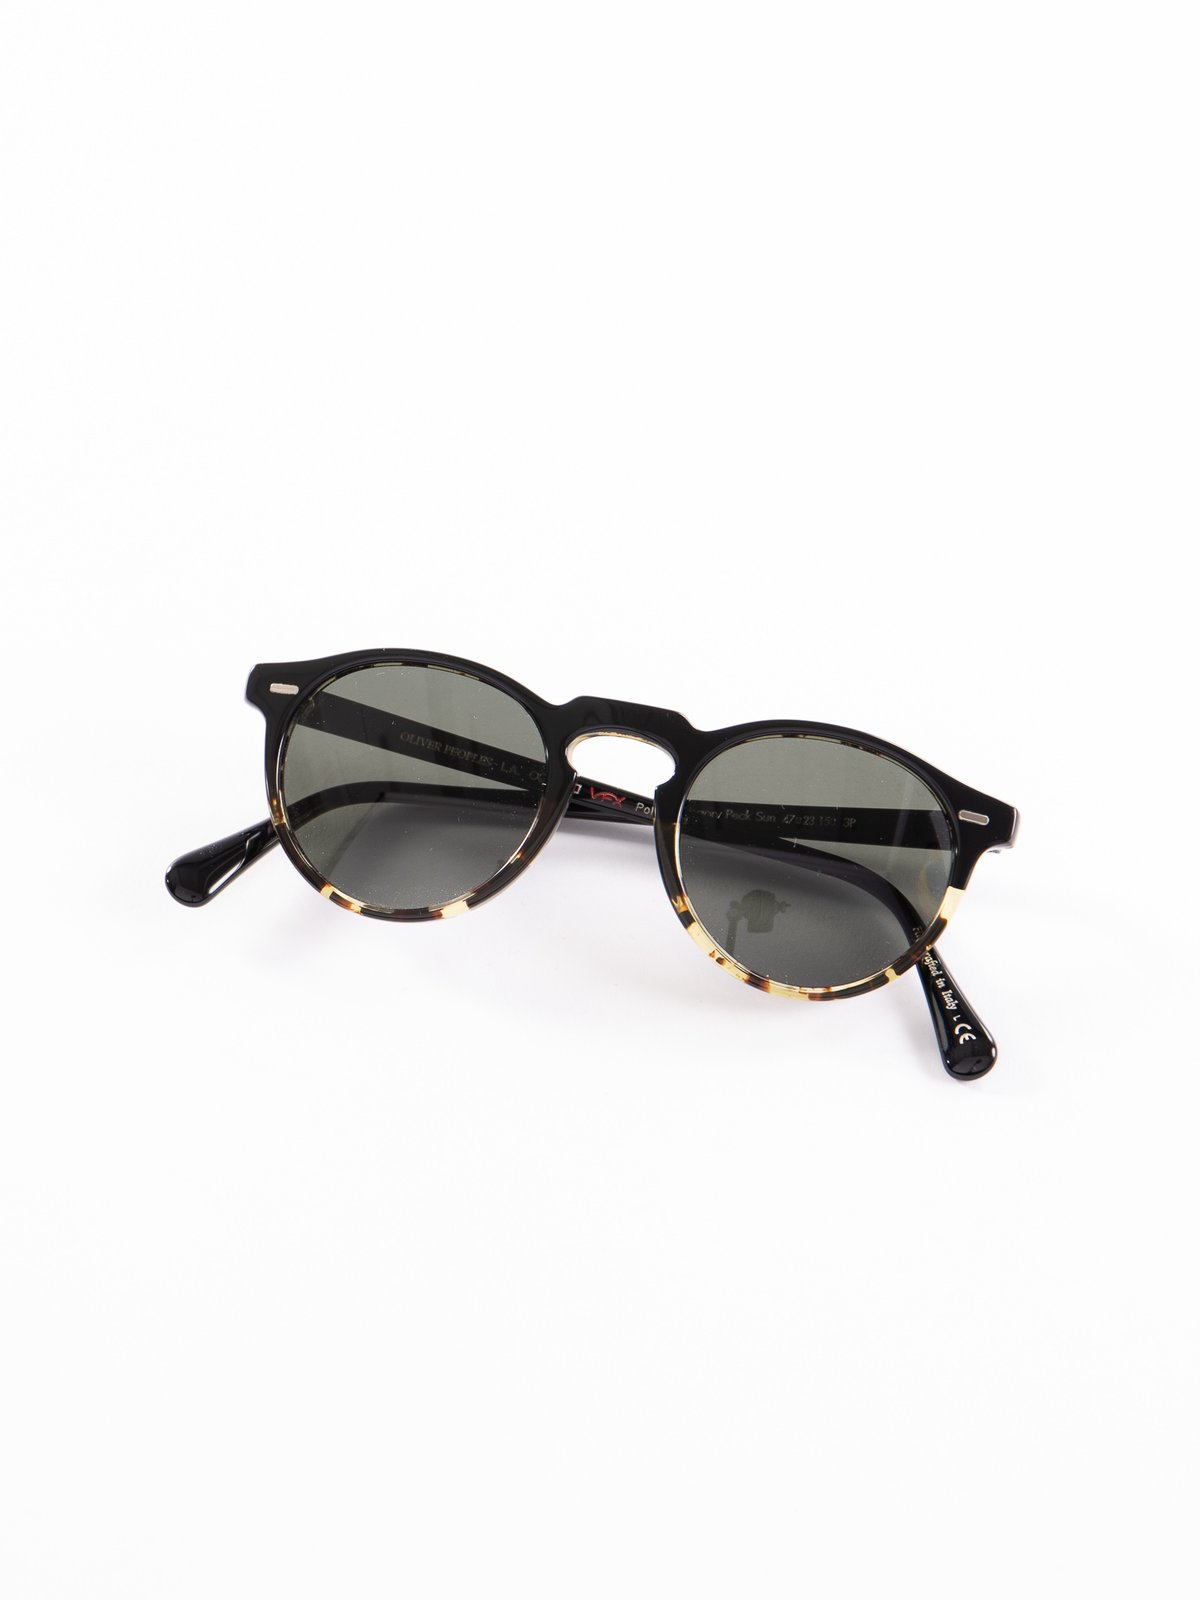 Black–DTBK Gradient/Green Polar Gregory Peck Sunglasses - Image 1